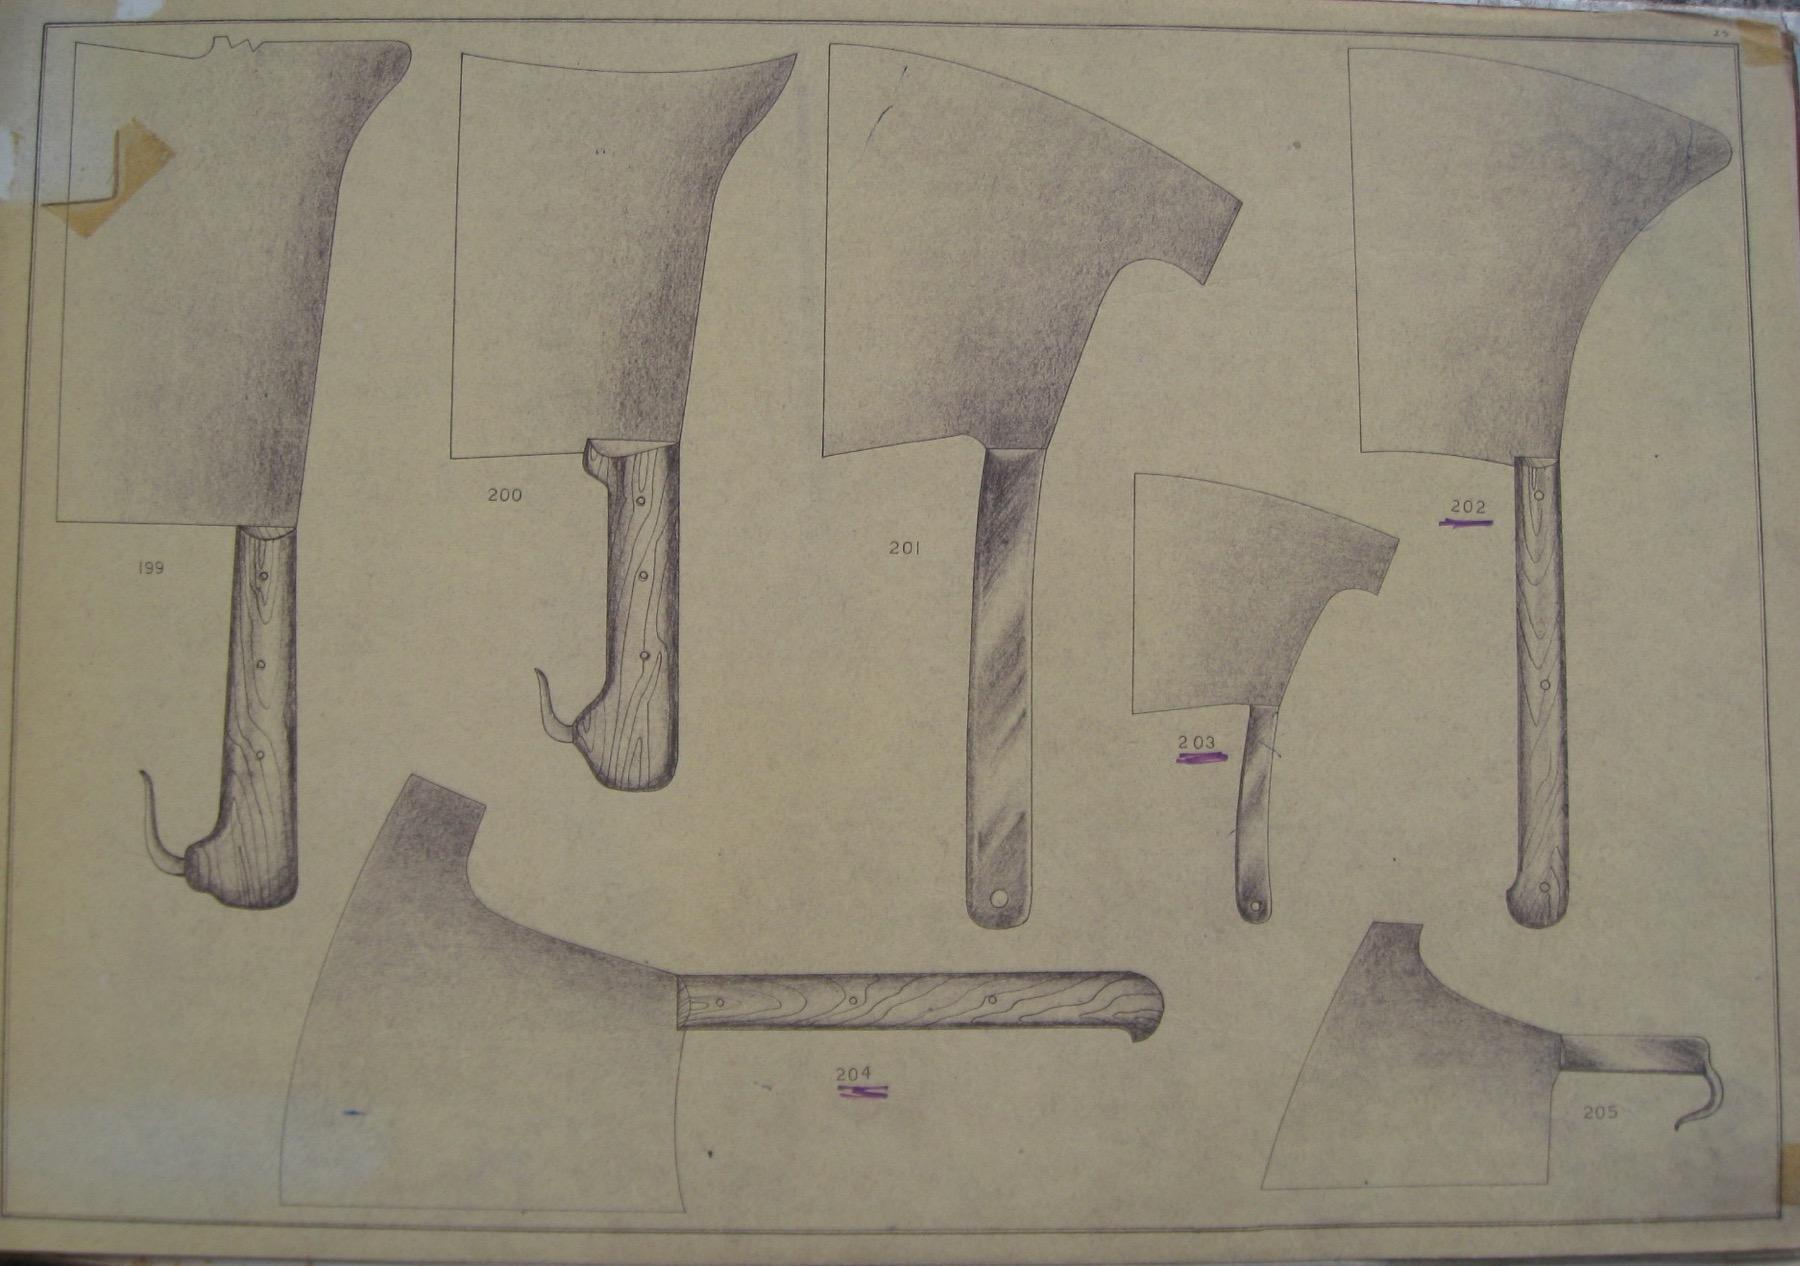 Mannaie, dal catalogo Due Ancore del 1953